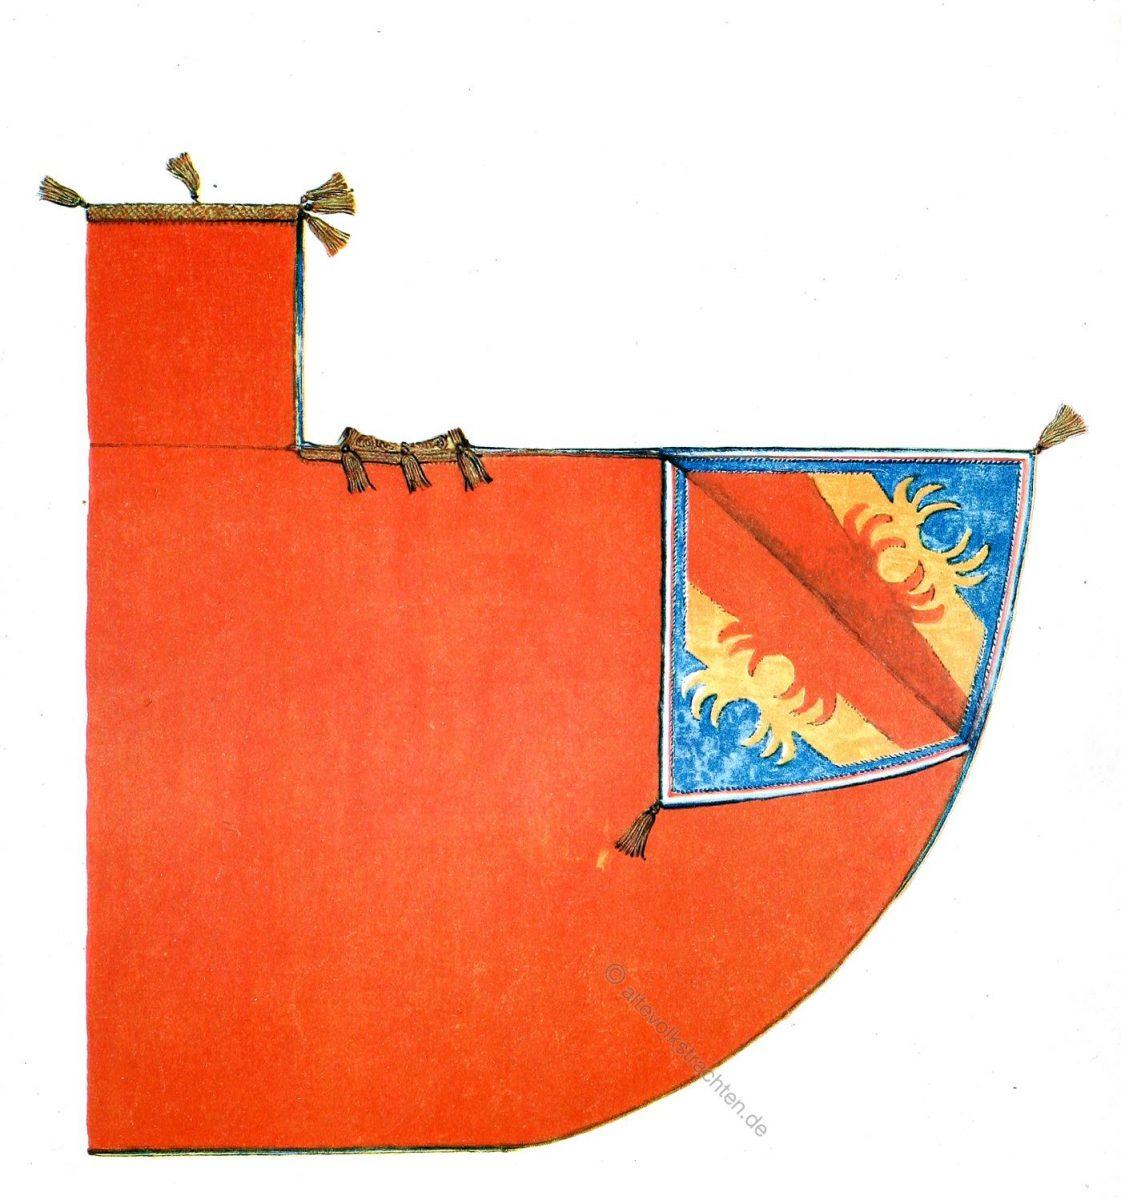 Burnus, Algerien, Trachten, Maghreb, Spahi, Militär, Kavallerie, Mantel